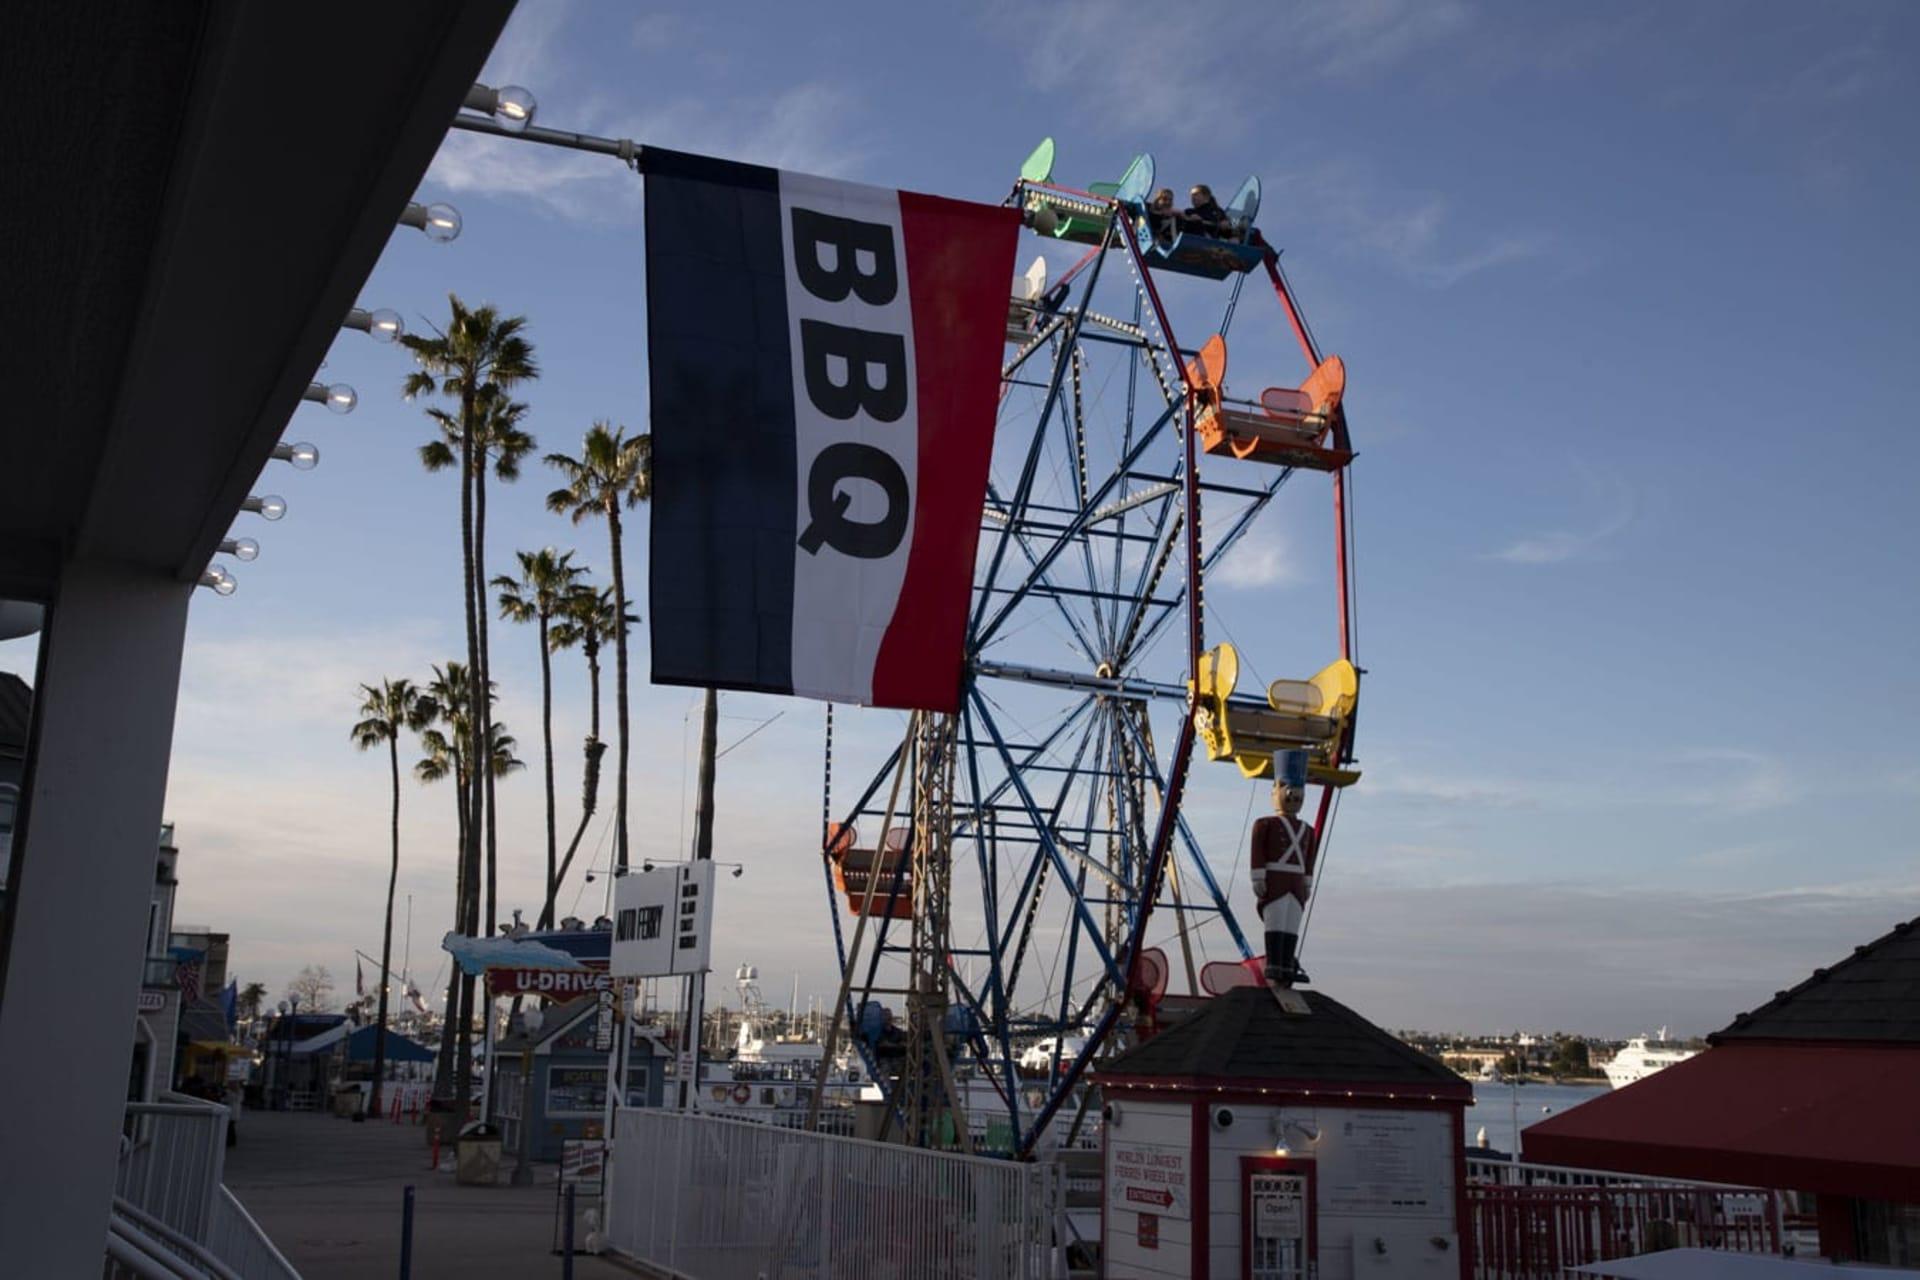 BBQ flag and ferris wheel